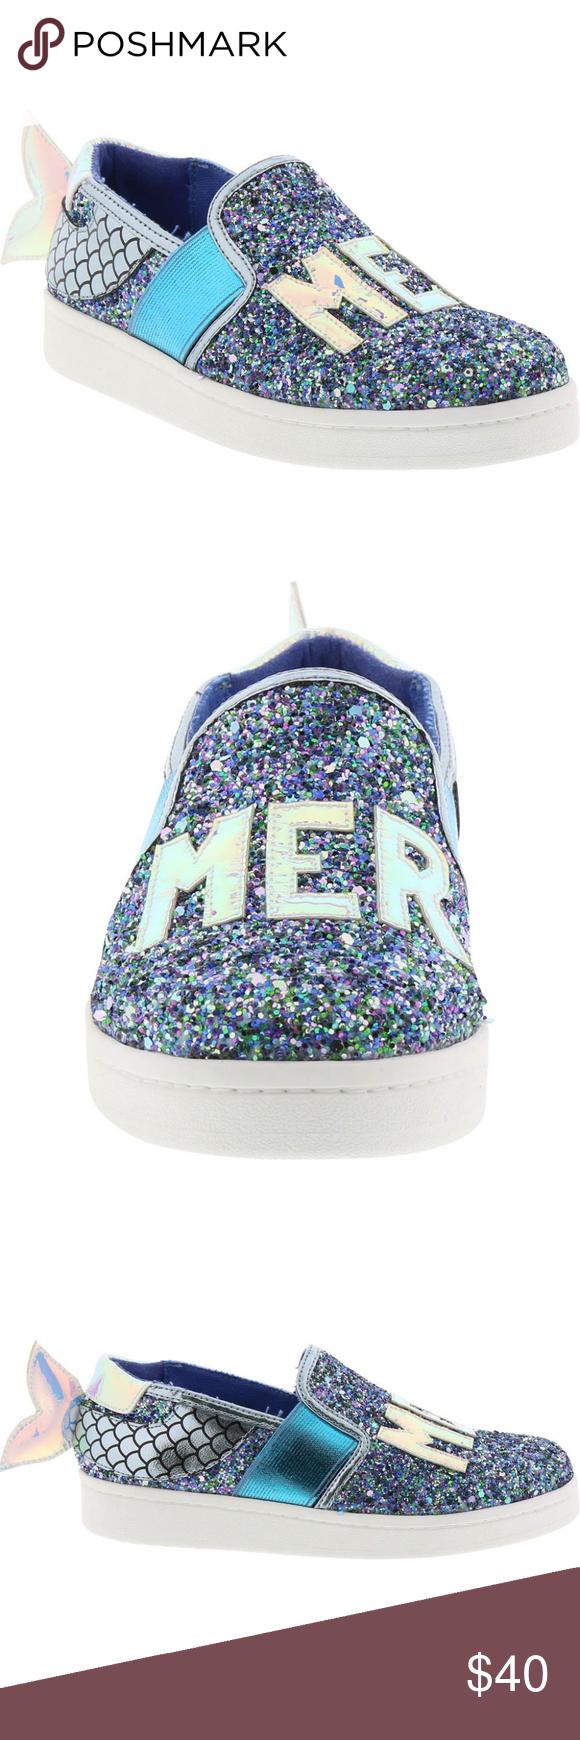 Sam Edelman Kids Shoes - Assorted Sizes